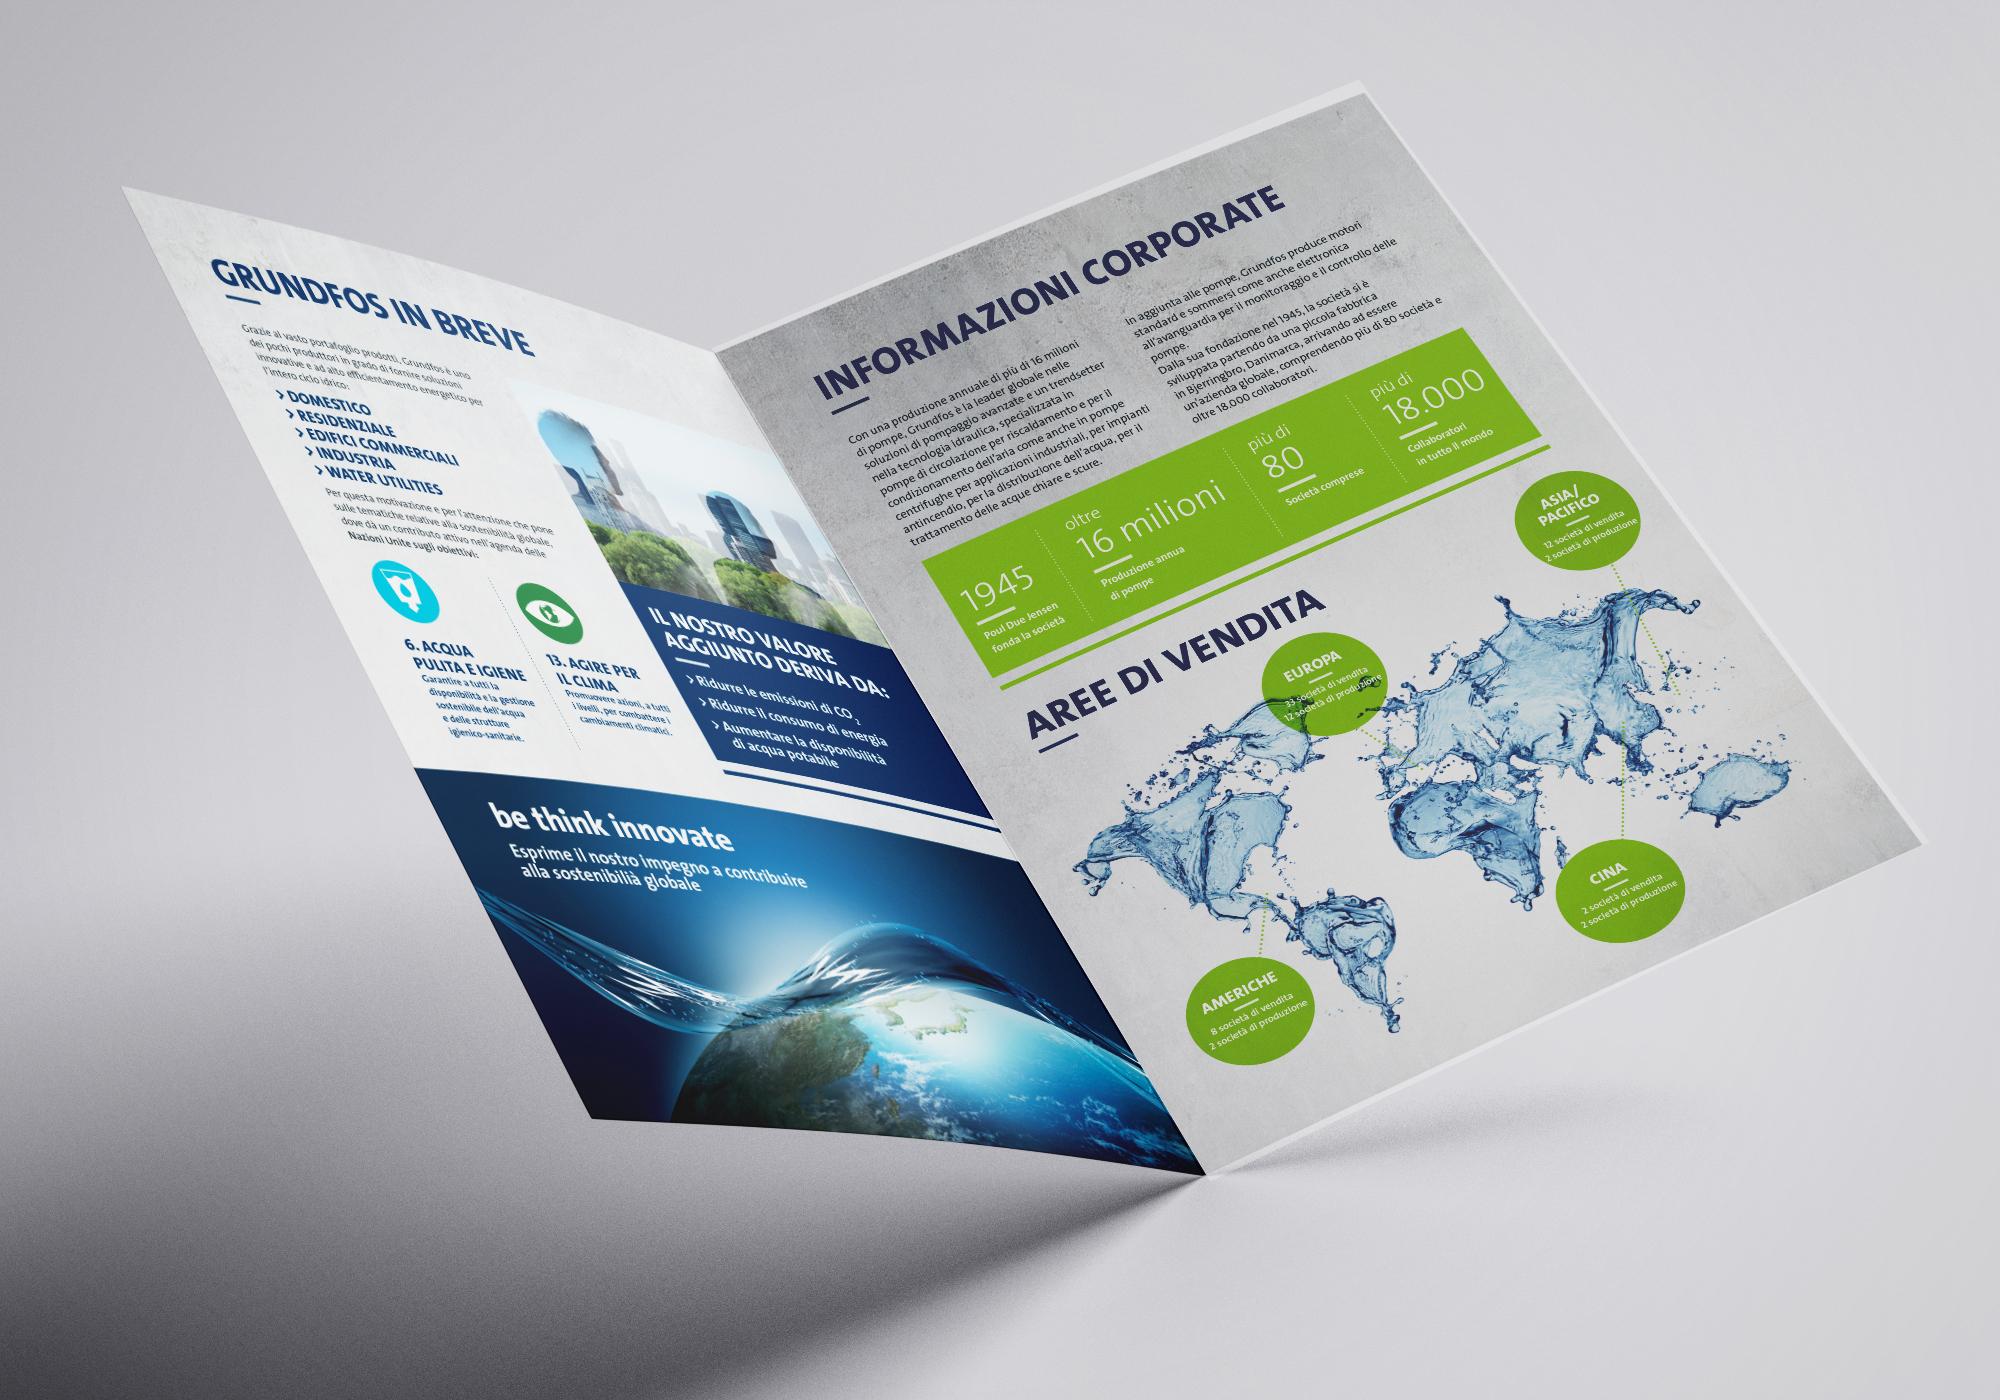 Grundfos brochure istituzionale aperta